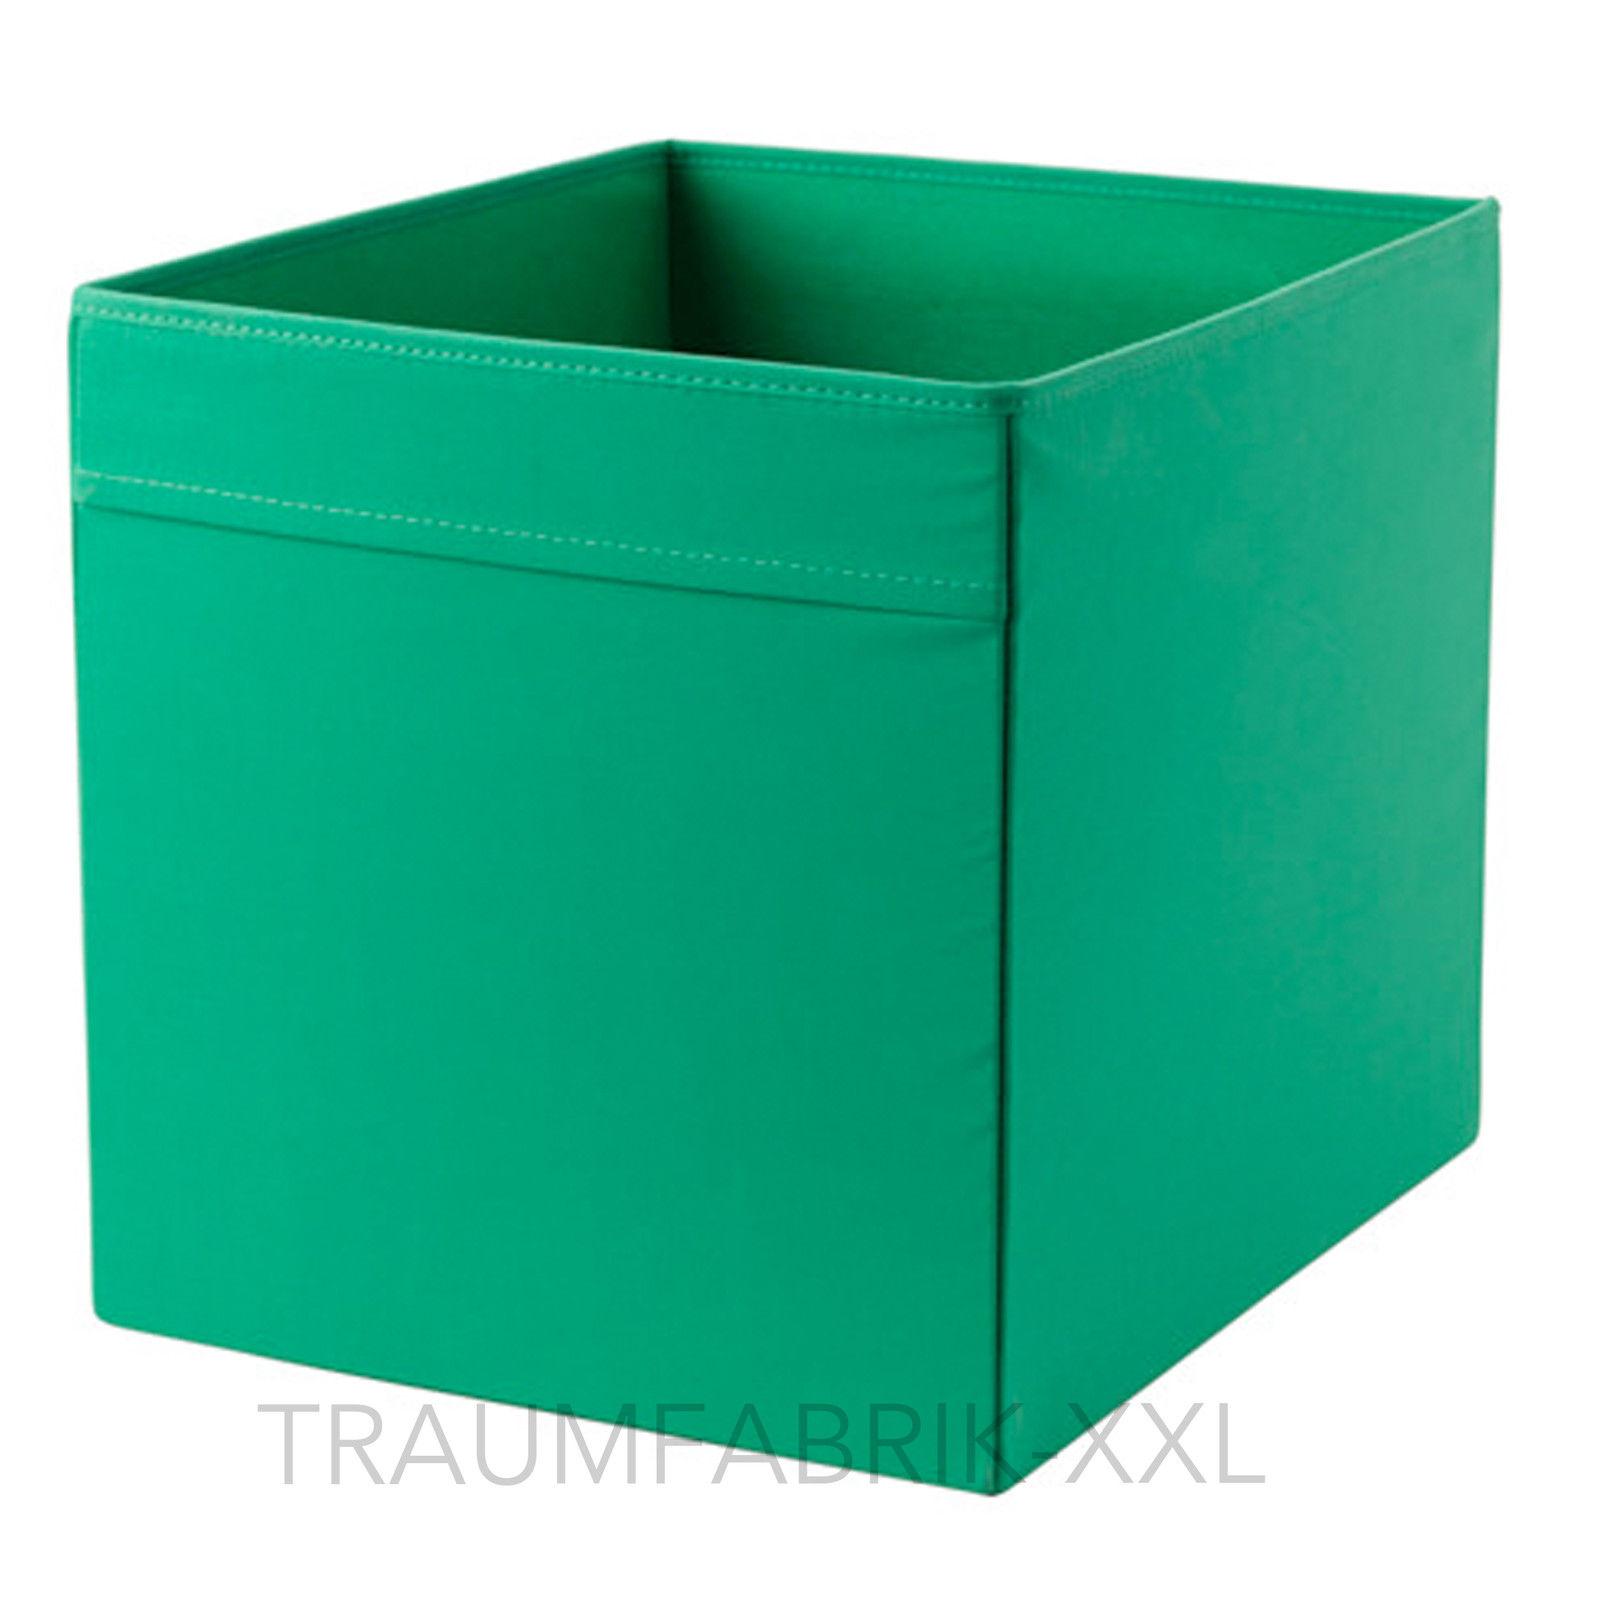 ikea dr na fach box f r expedit kallax regal kiste aufbewahrungsbox 33x33cm gr n traumfabrik xxl. Black Bedroom Furniture Sets. Home Design Ideas